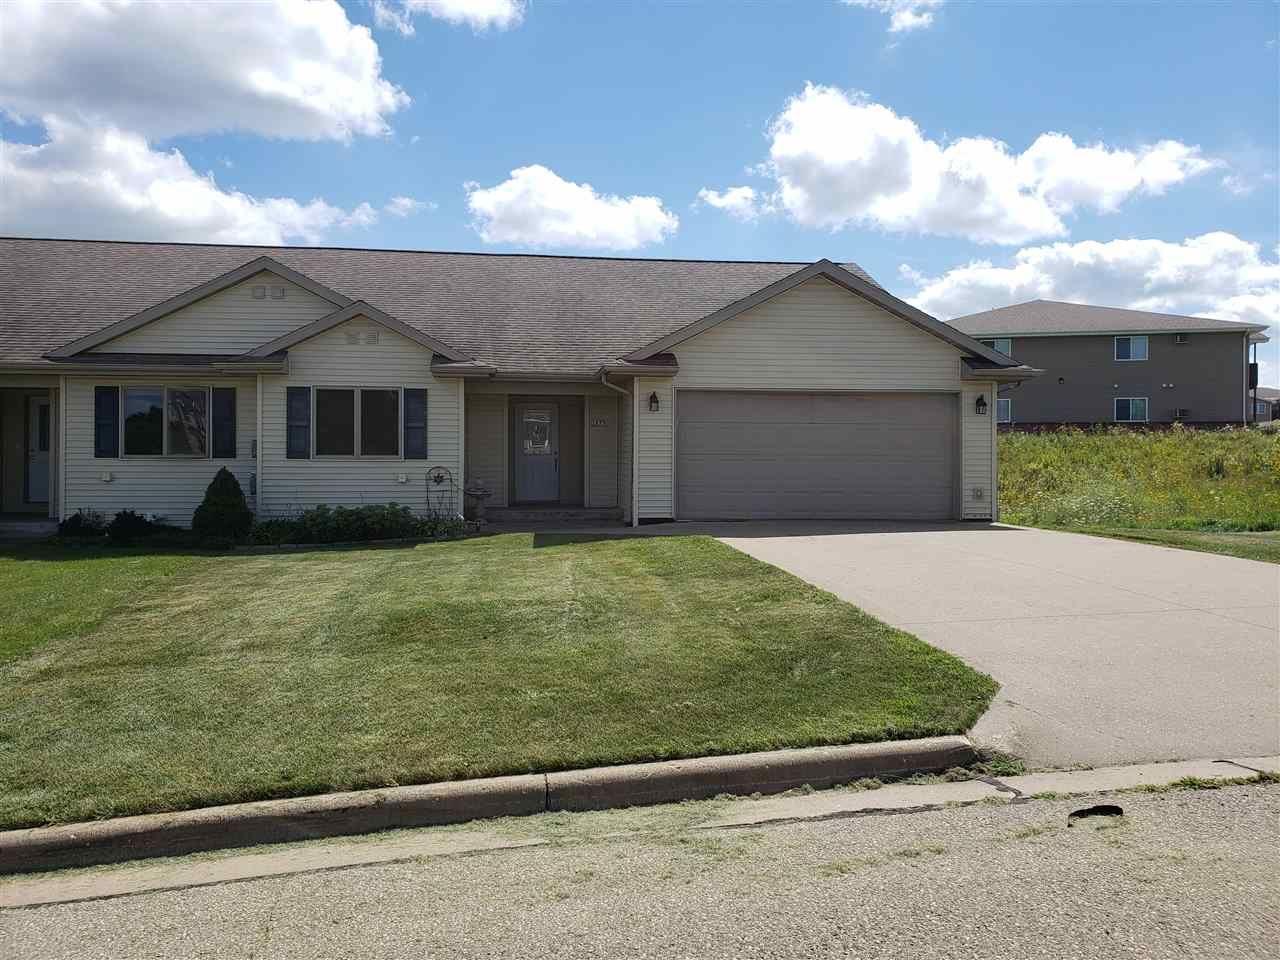 1577 Edgewood Ct, Platteville, WI 53818 - #: 1889140